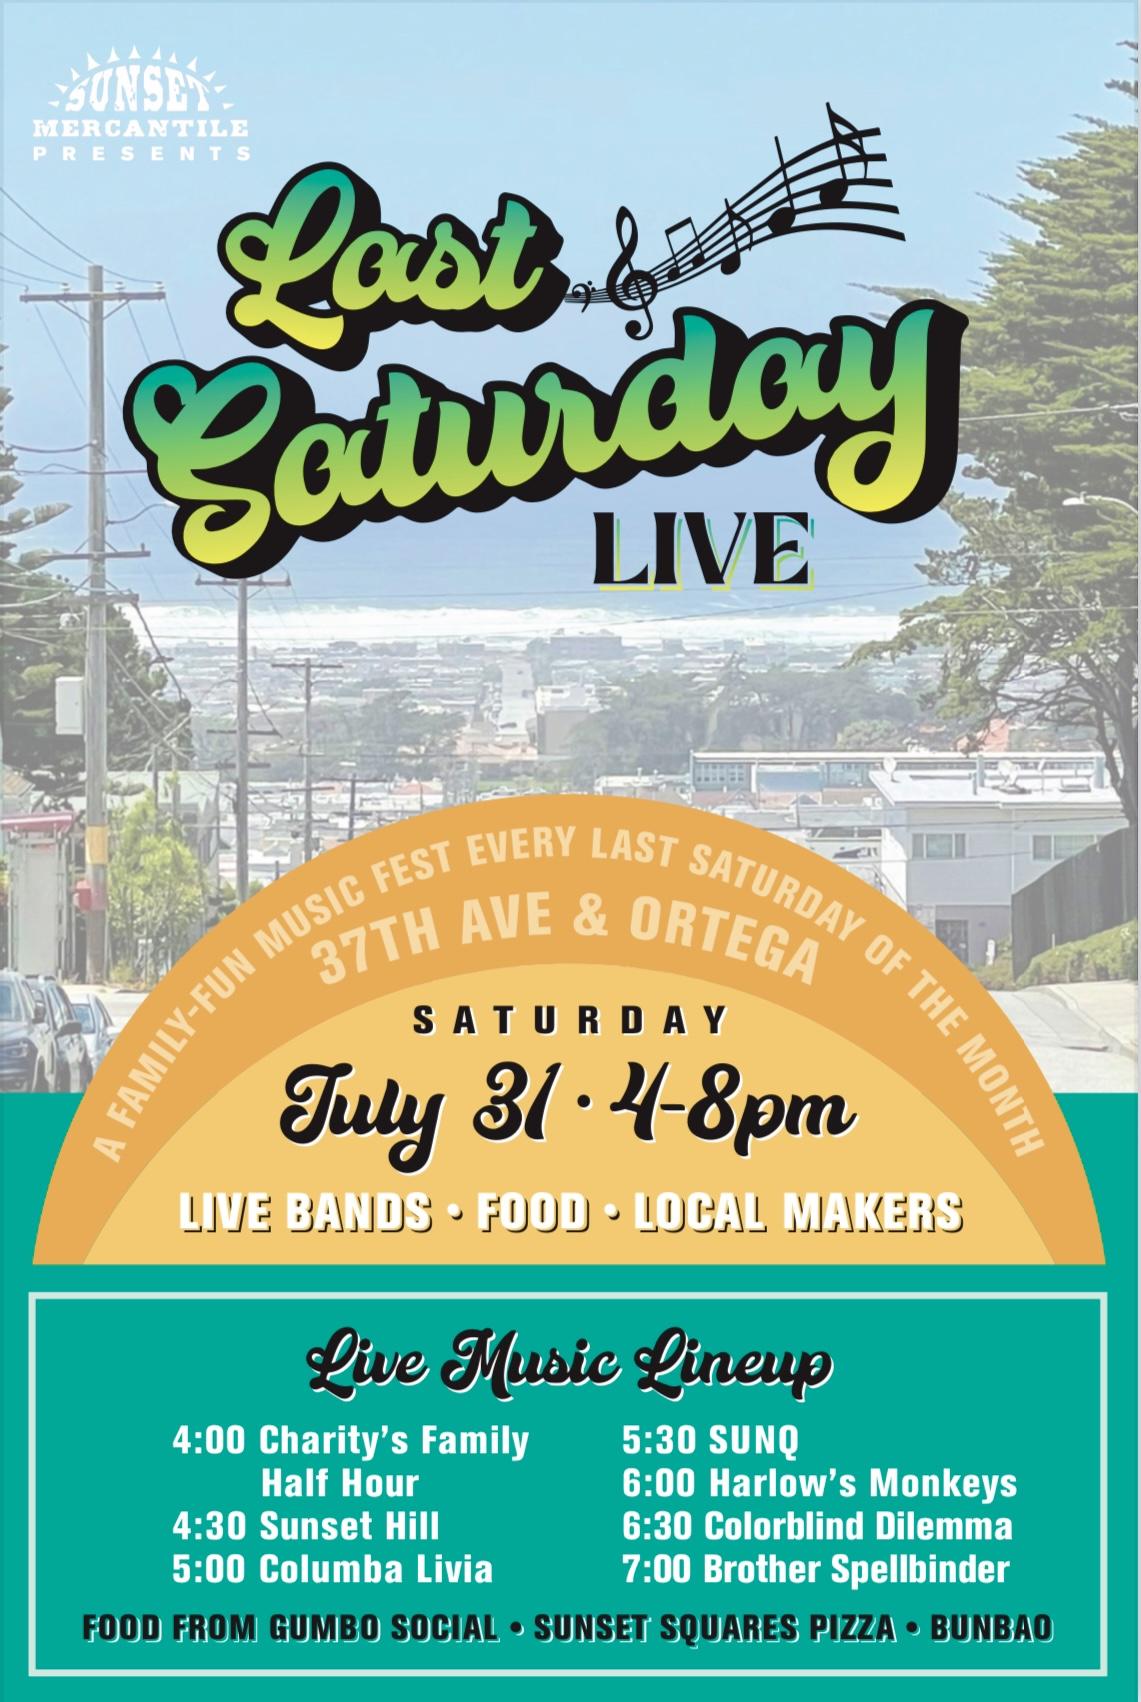 Sunset Community Mercantile: Last Saturday Live